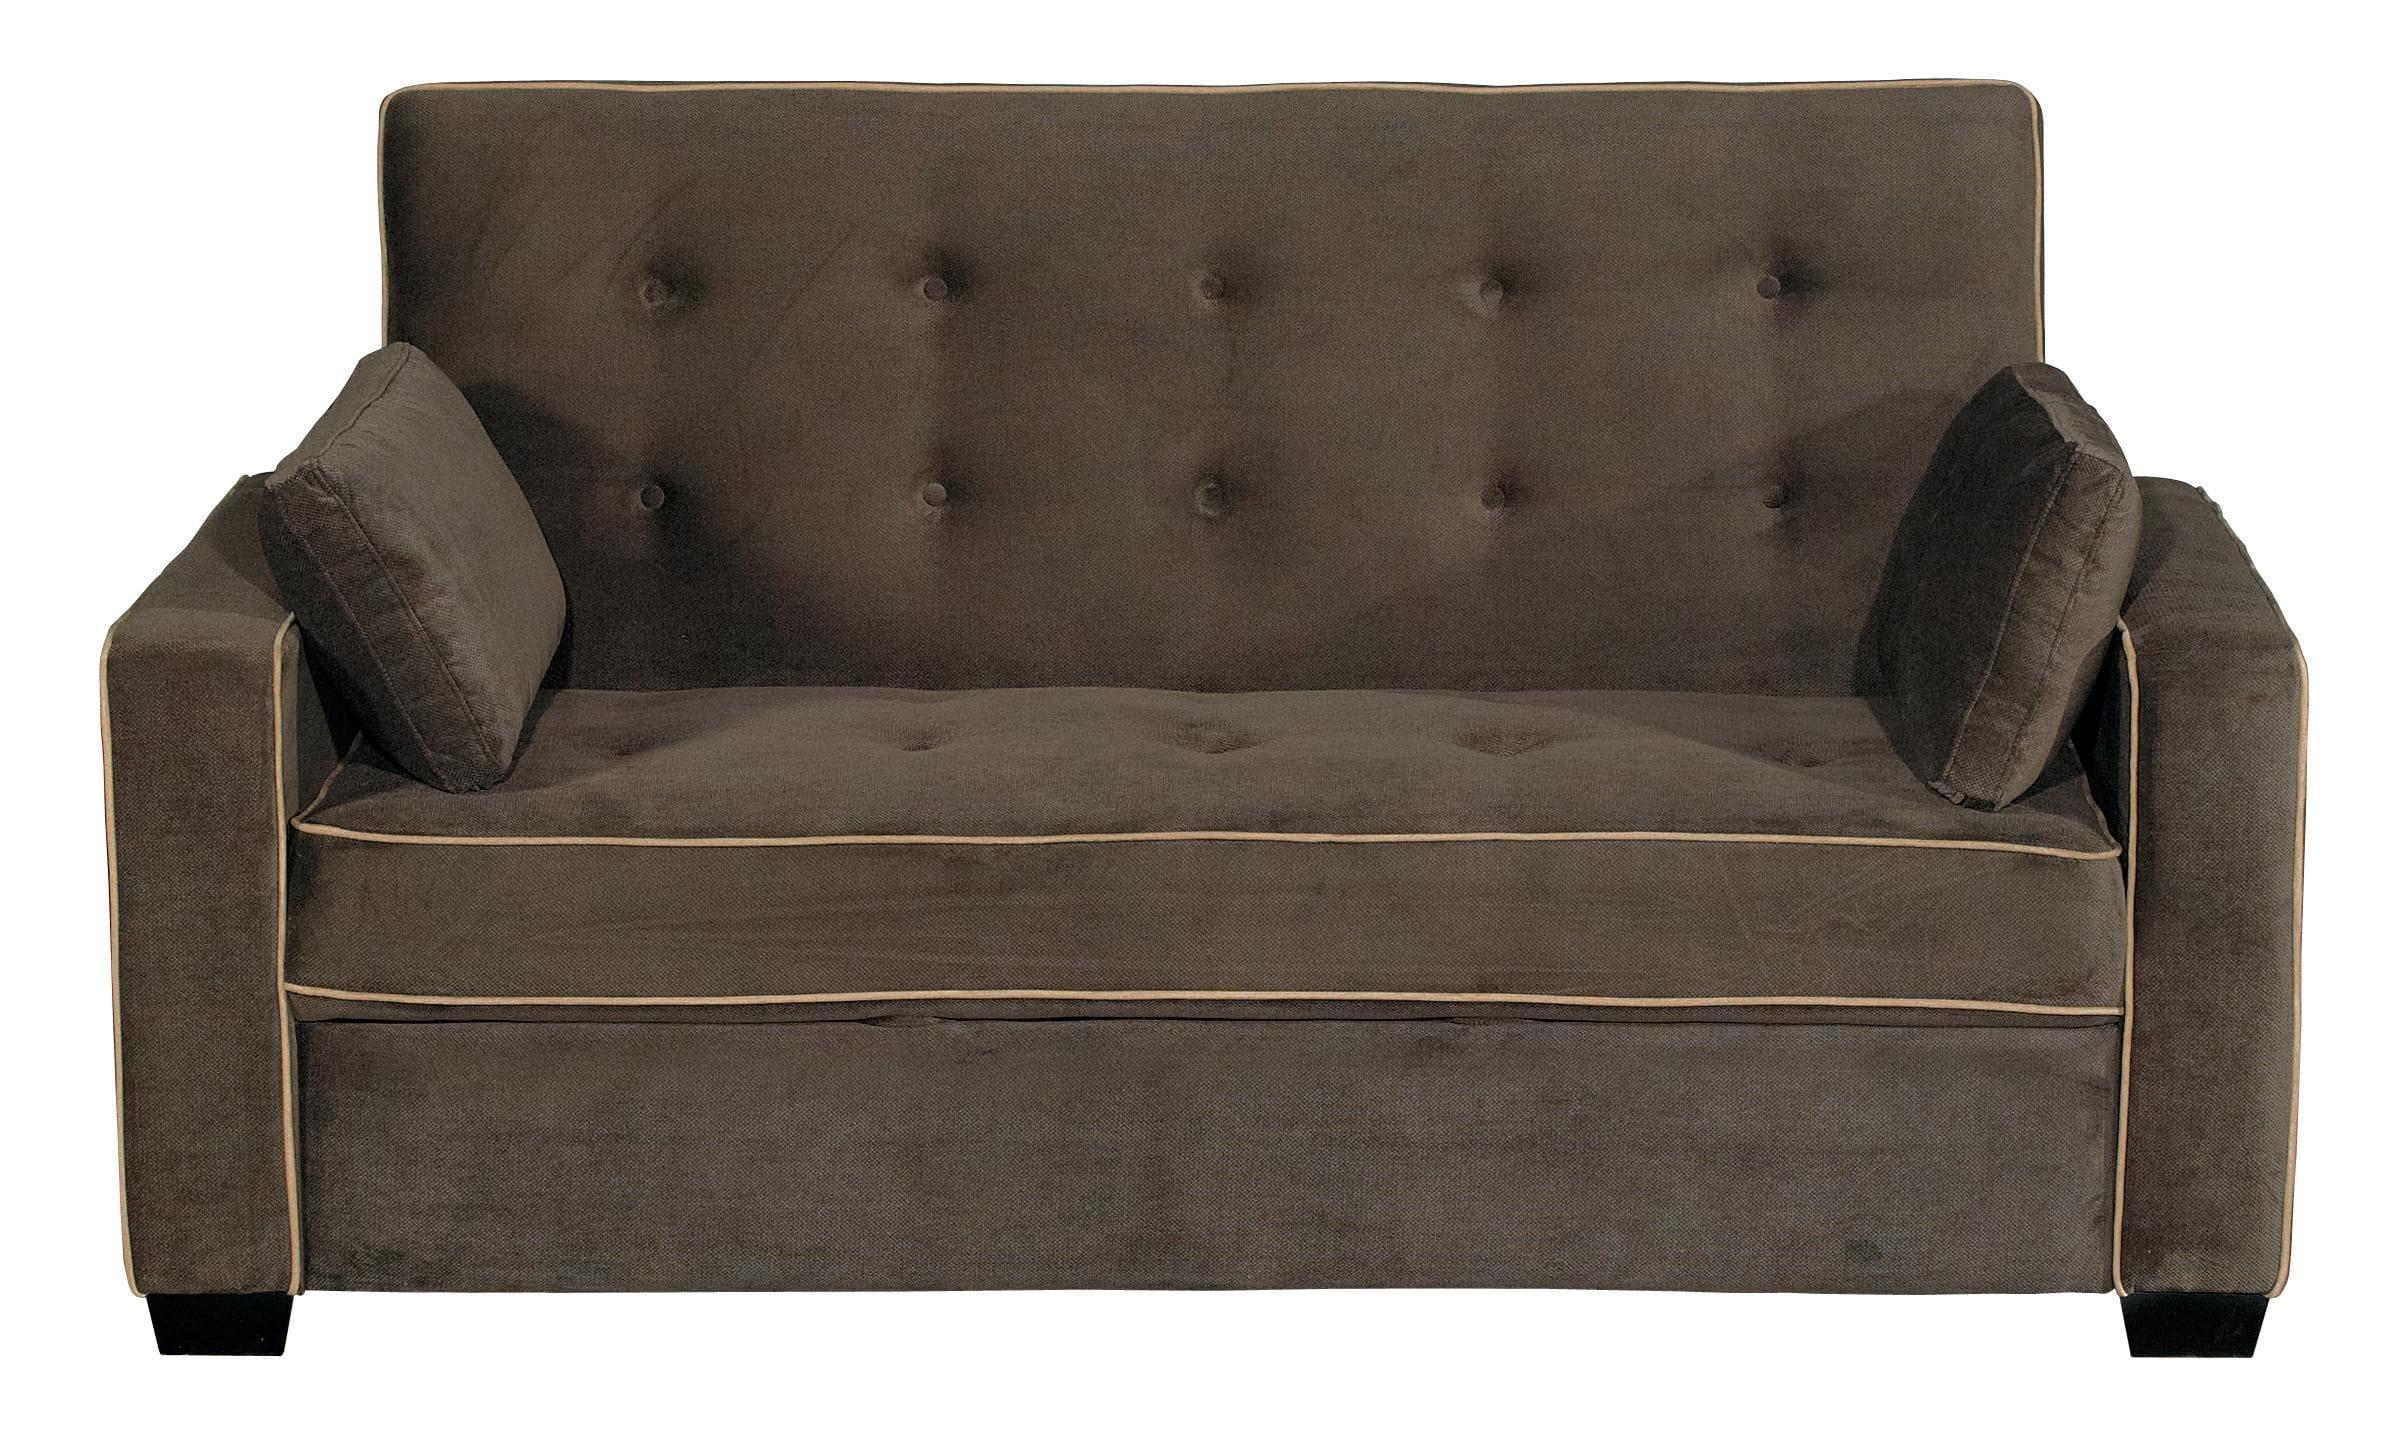 Pleasing Augustine Loveseat Full Size Sleeper Java By Serta Lifestyle Ibusinesslaw Wood Chair Design Ideas Ibusinesslaworg